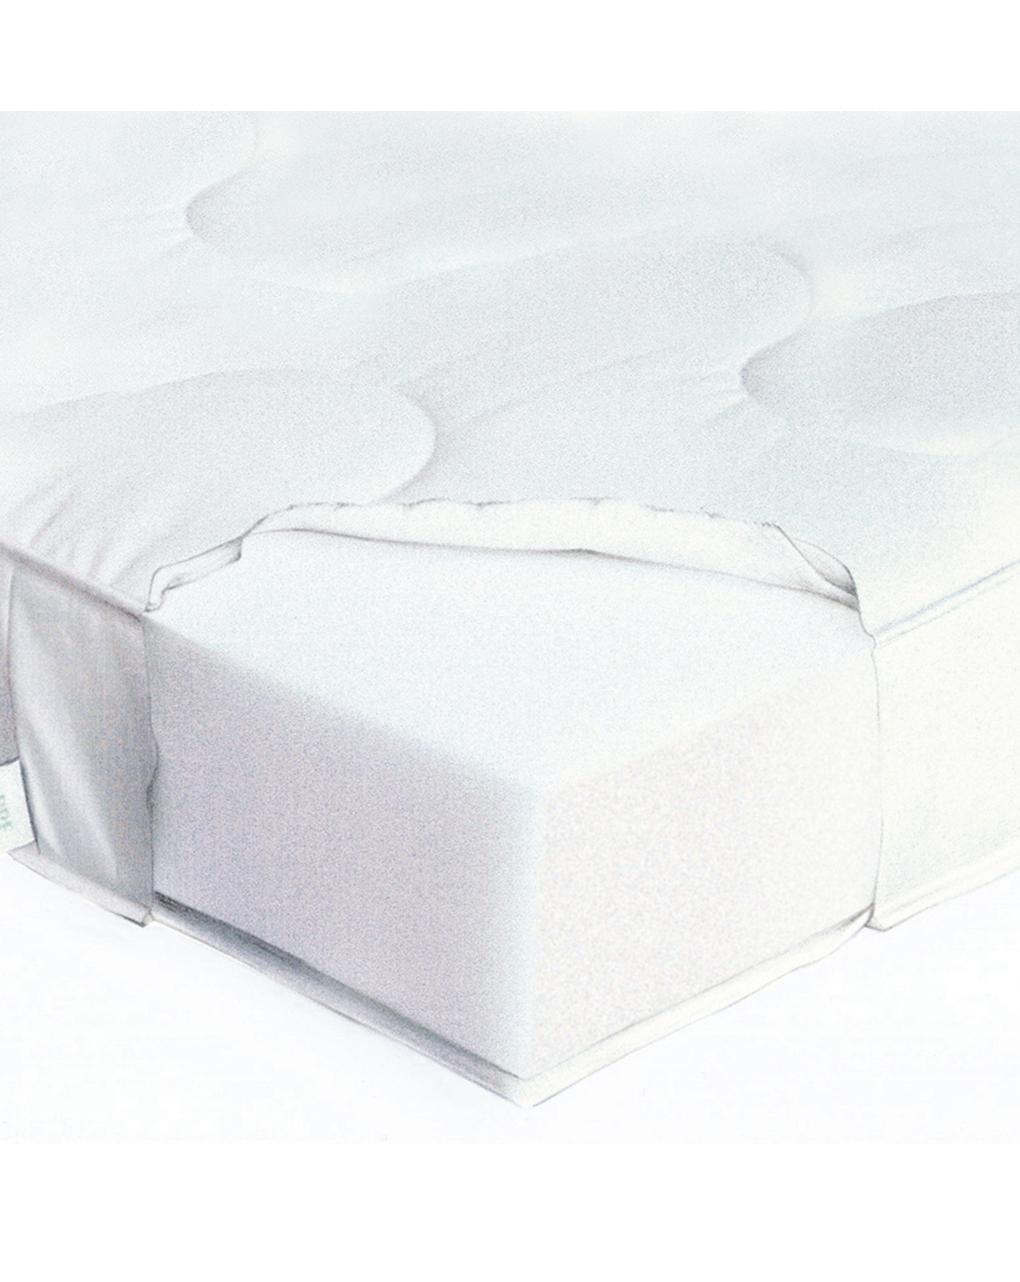 Colchão acolchoado 125x62 cm - Giordani